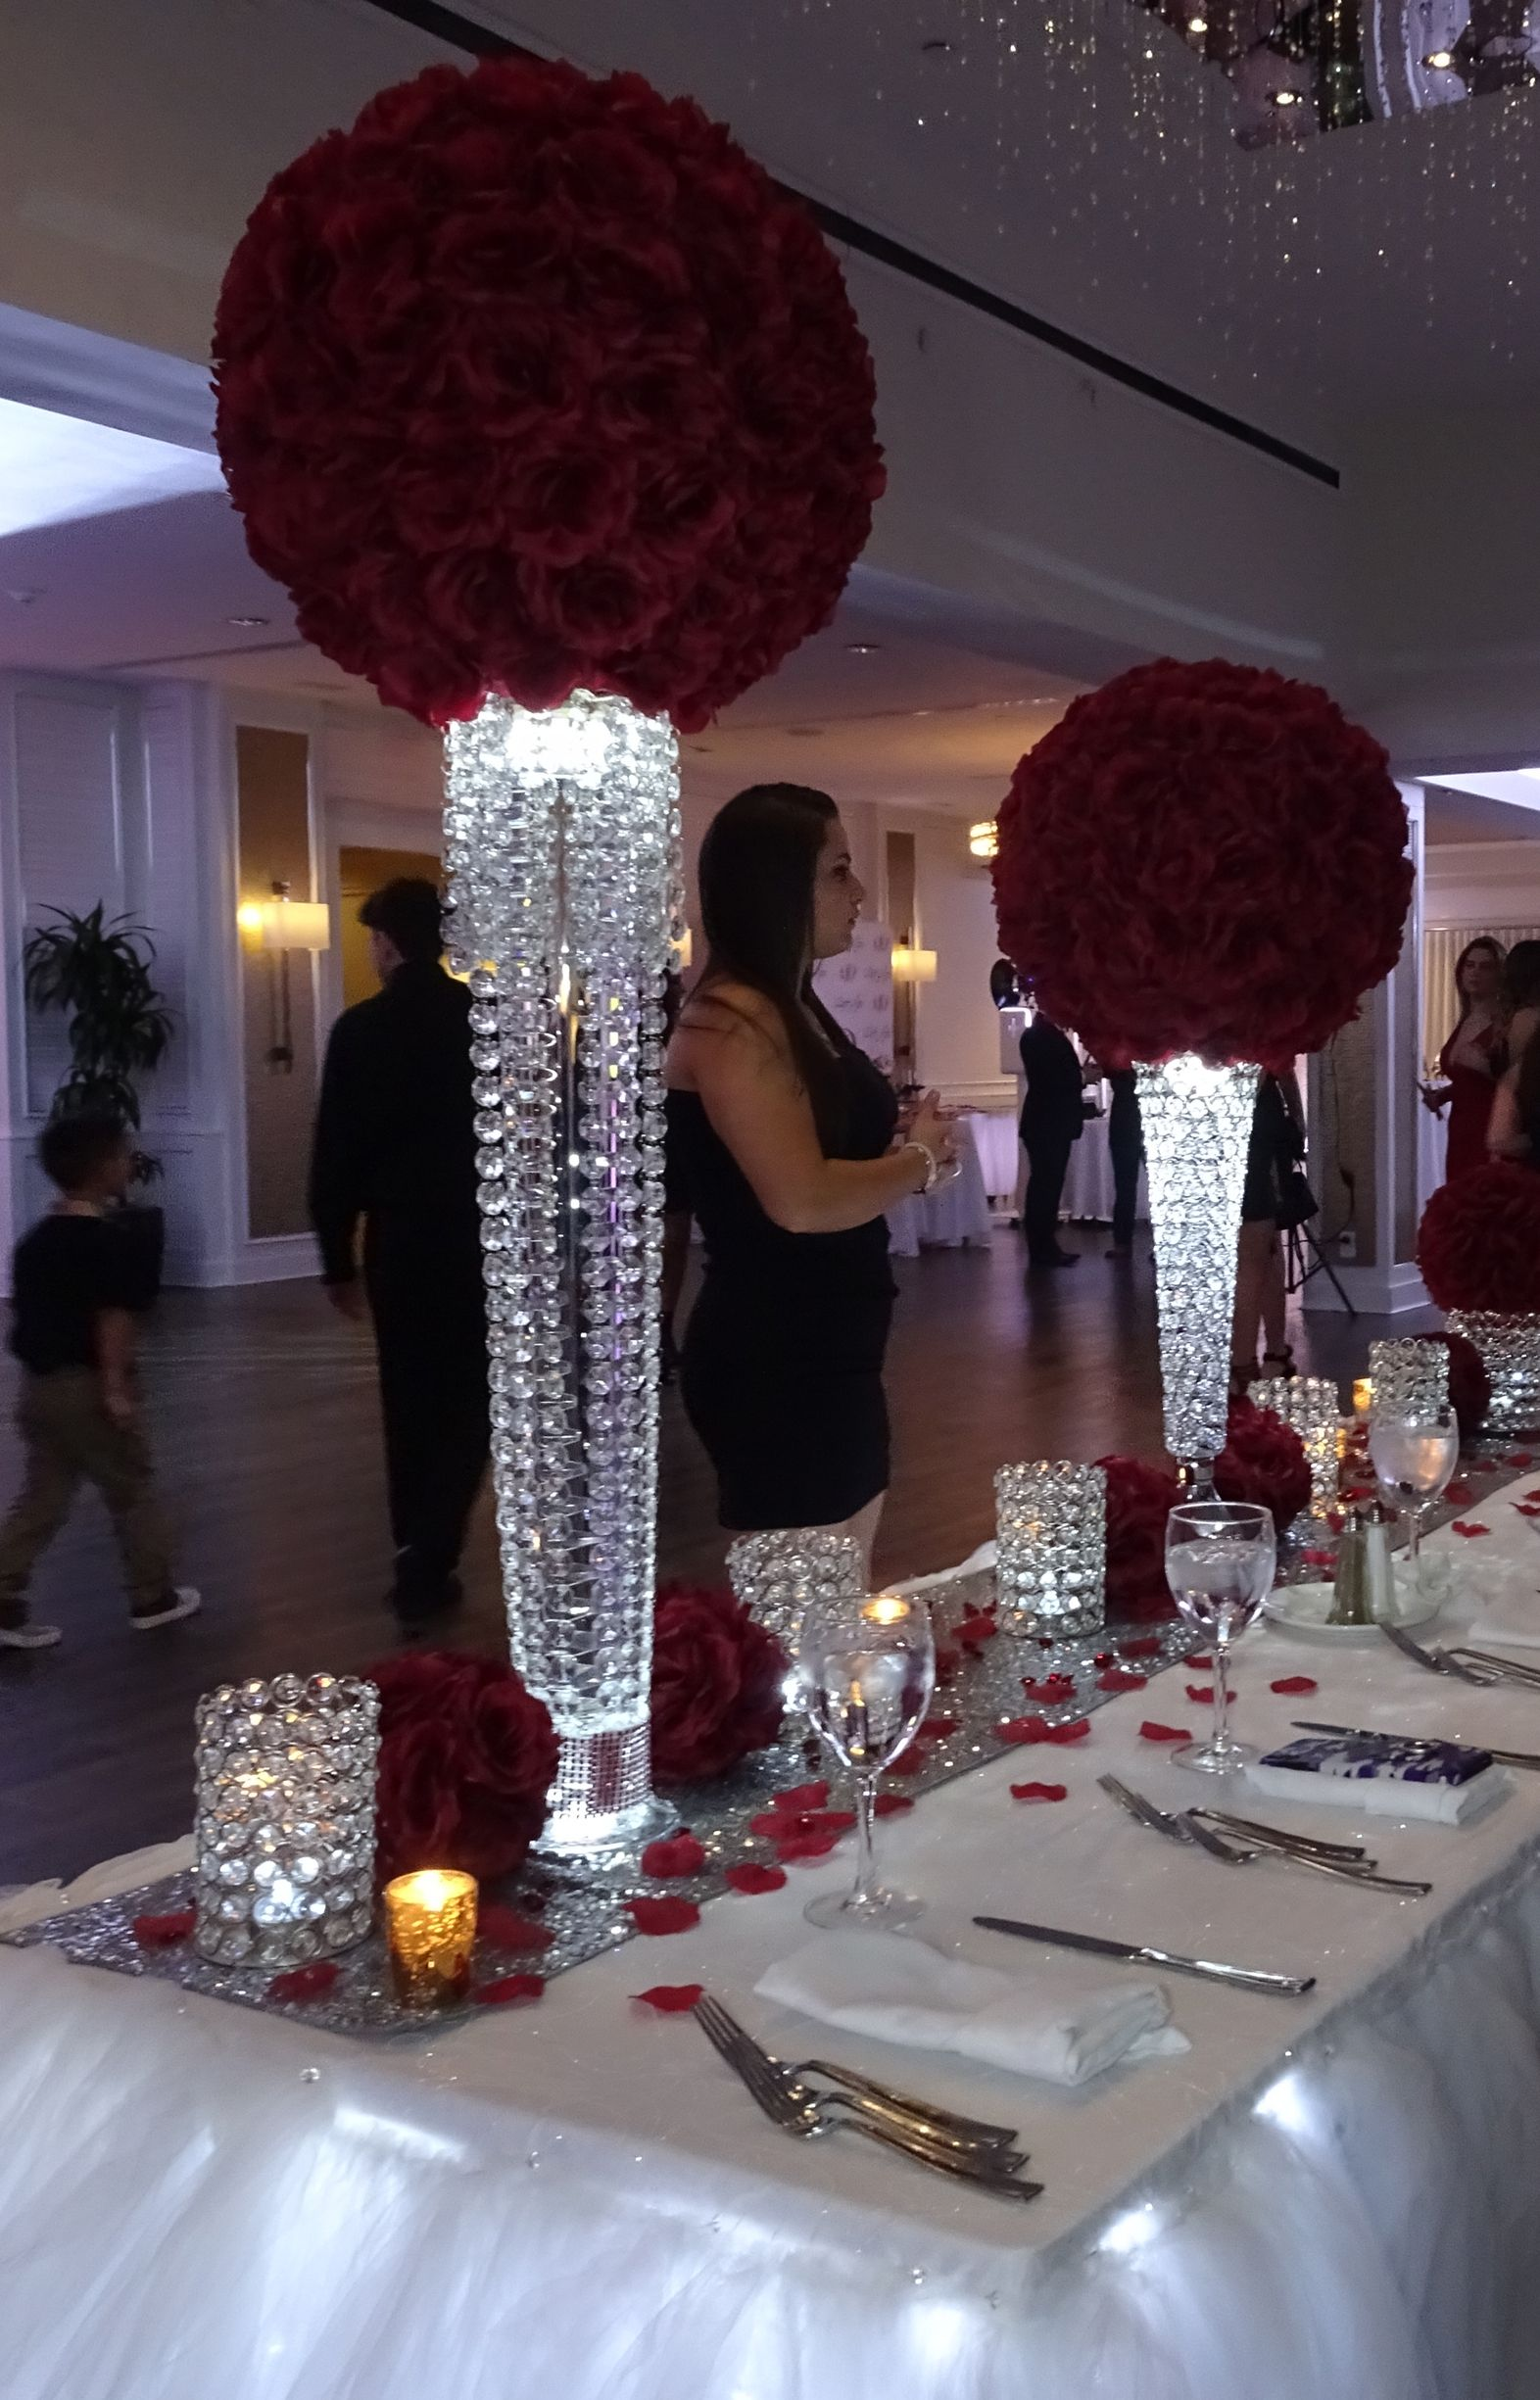 Burgundy Rose Ball Pomander Centerpiece Rentals Centerpiece Rentals Pomander Centerpiece Bling Wedding Centerpieces